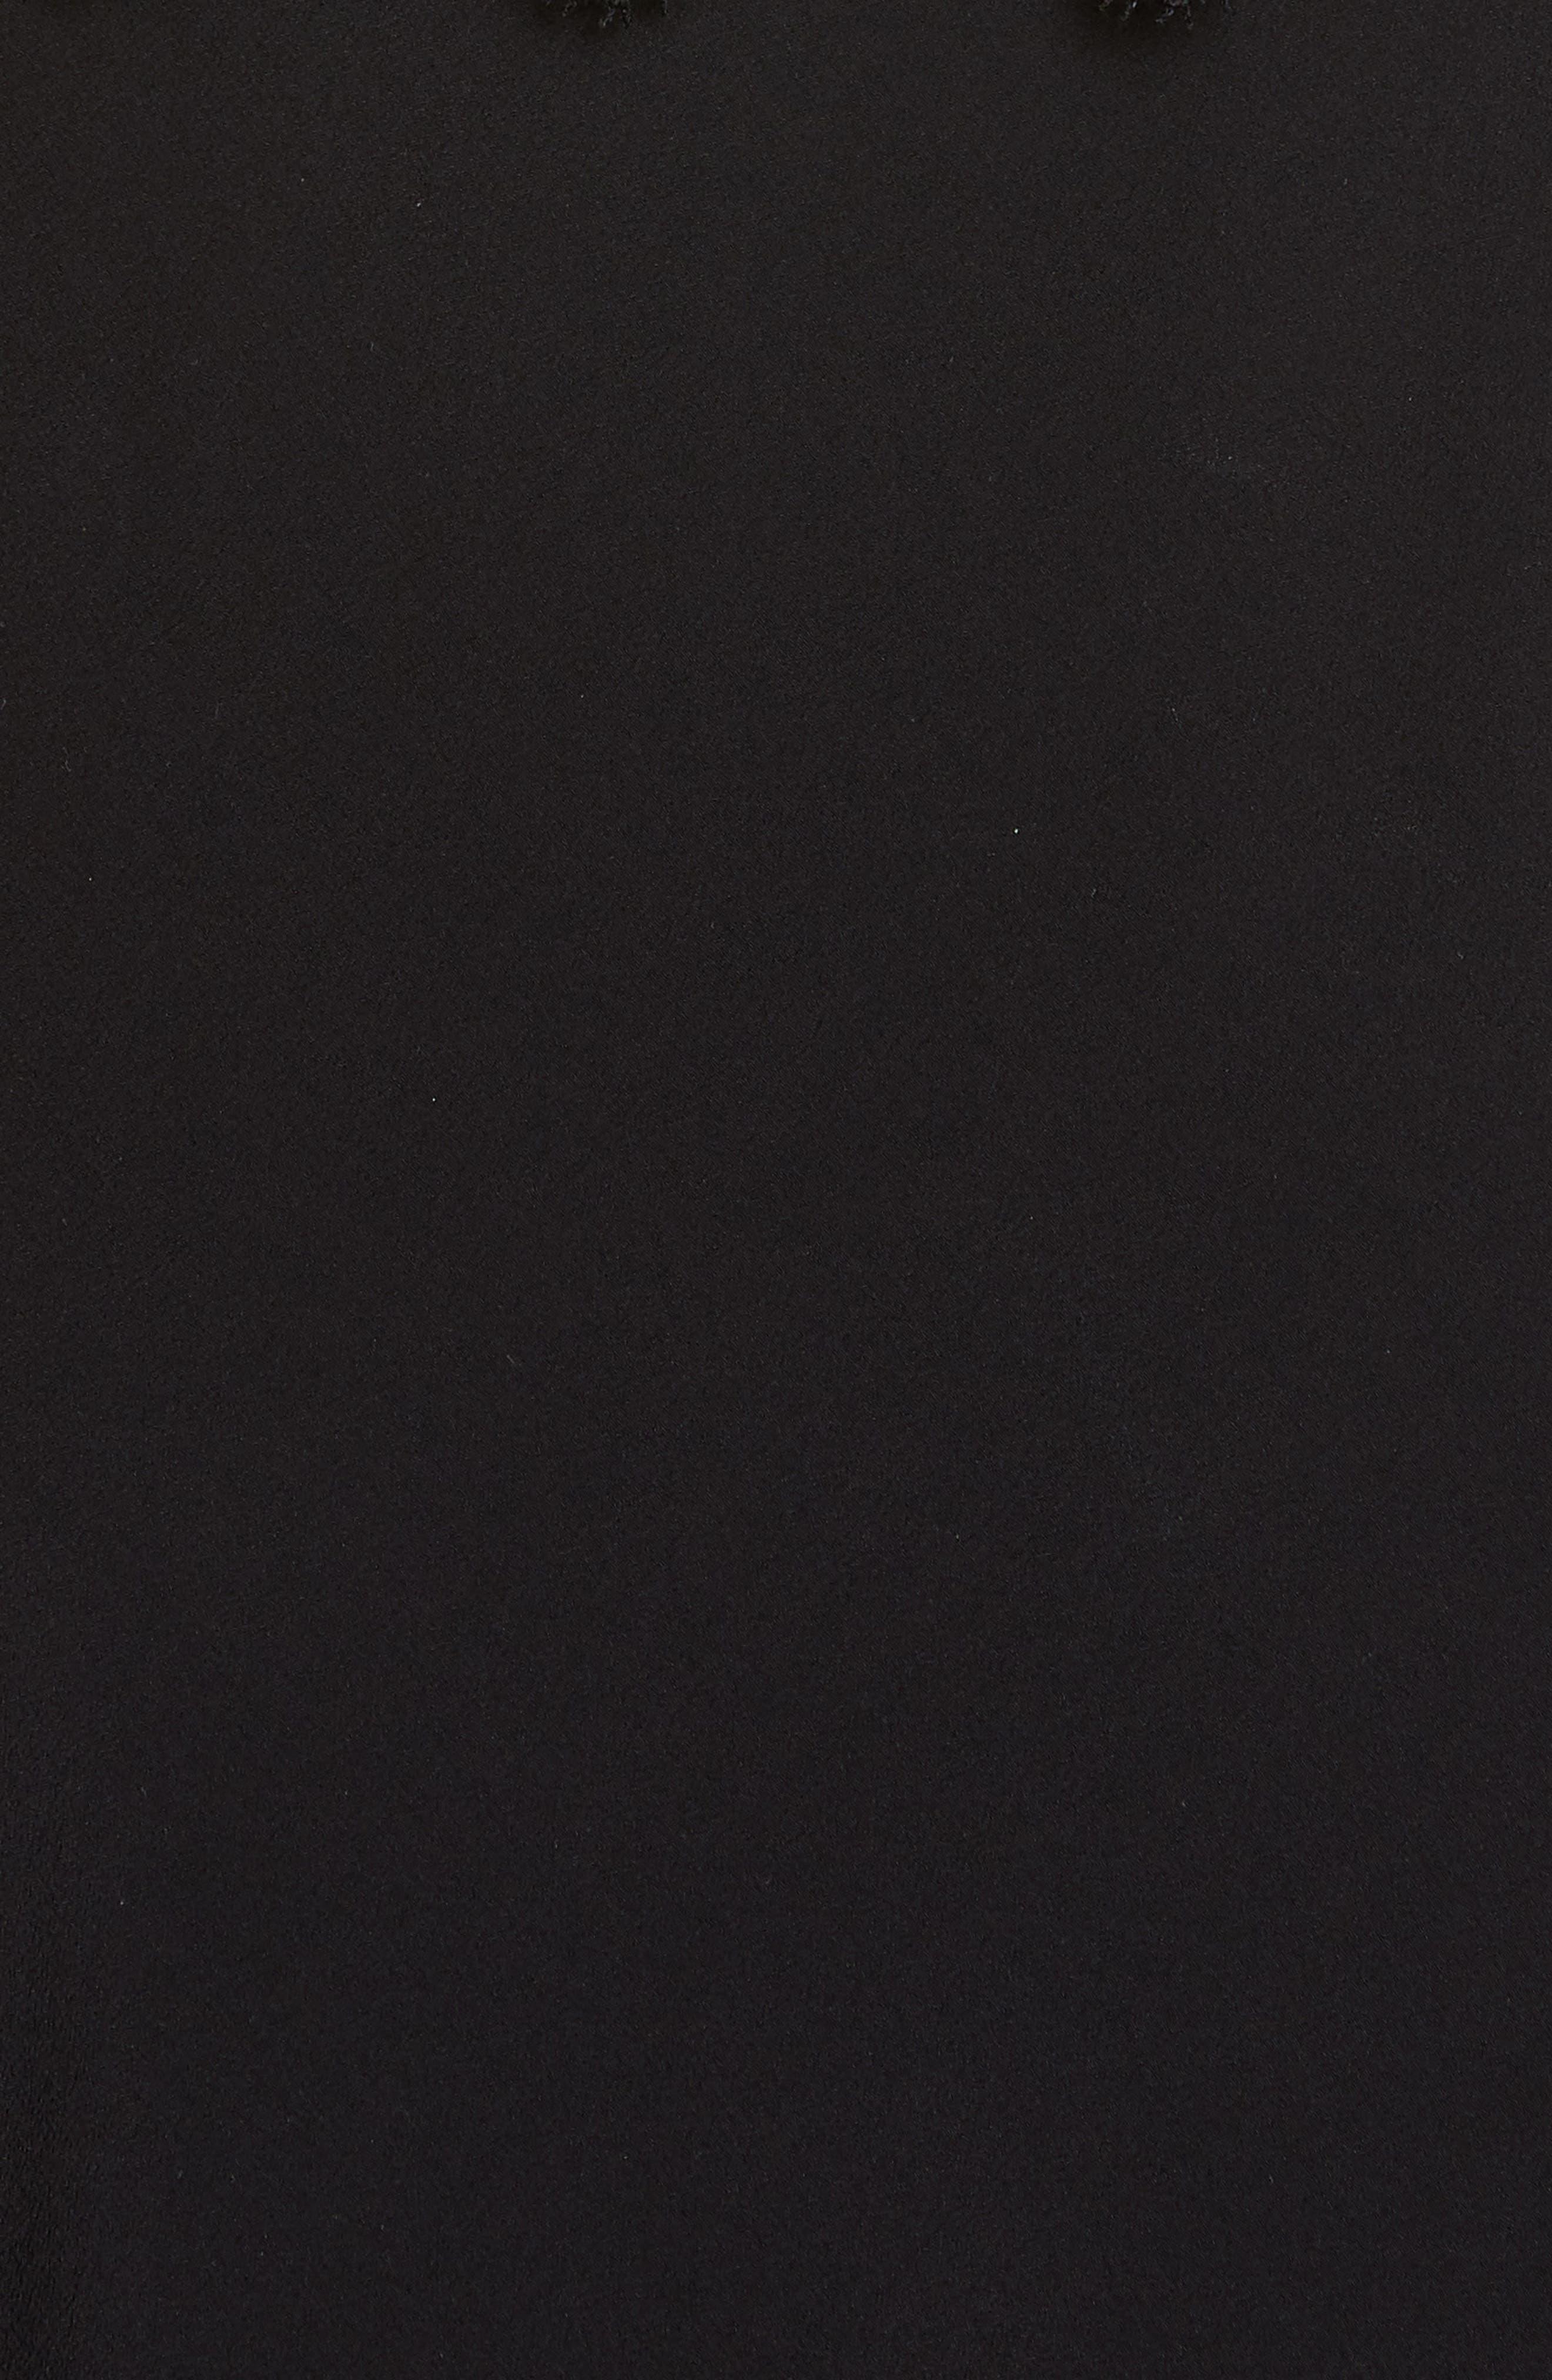 VICTORIA BECKHAM, Mixed Lace Trim High/Low Silk Dress, Alternate thumbnail 7, color, BLACK